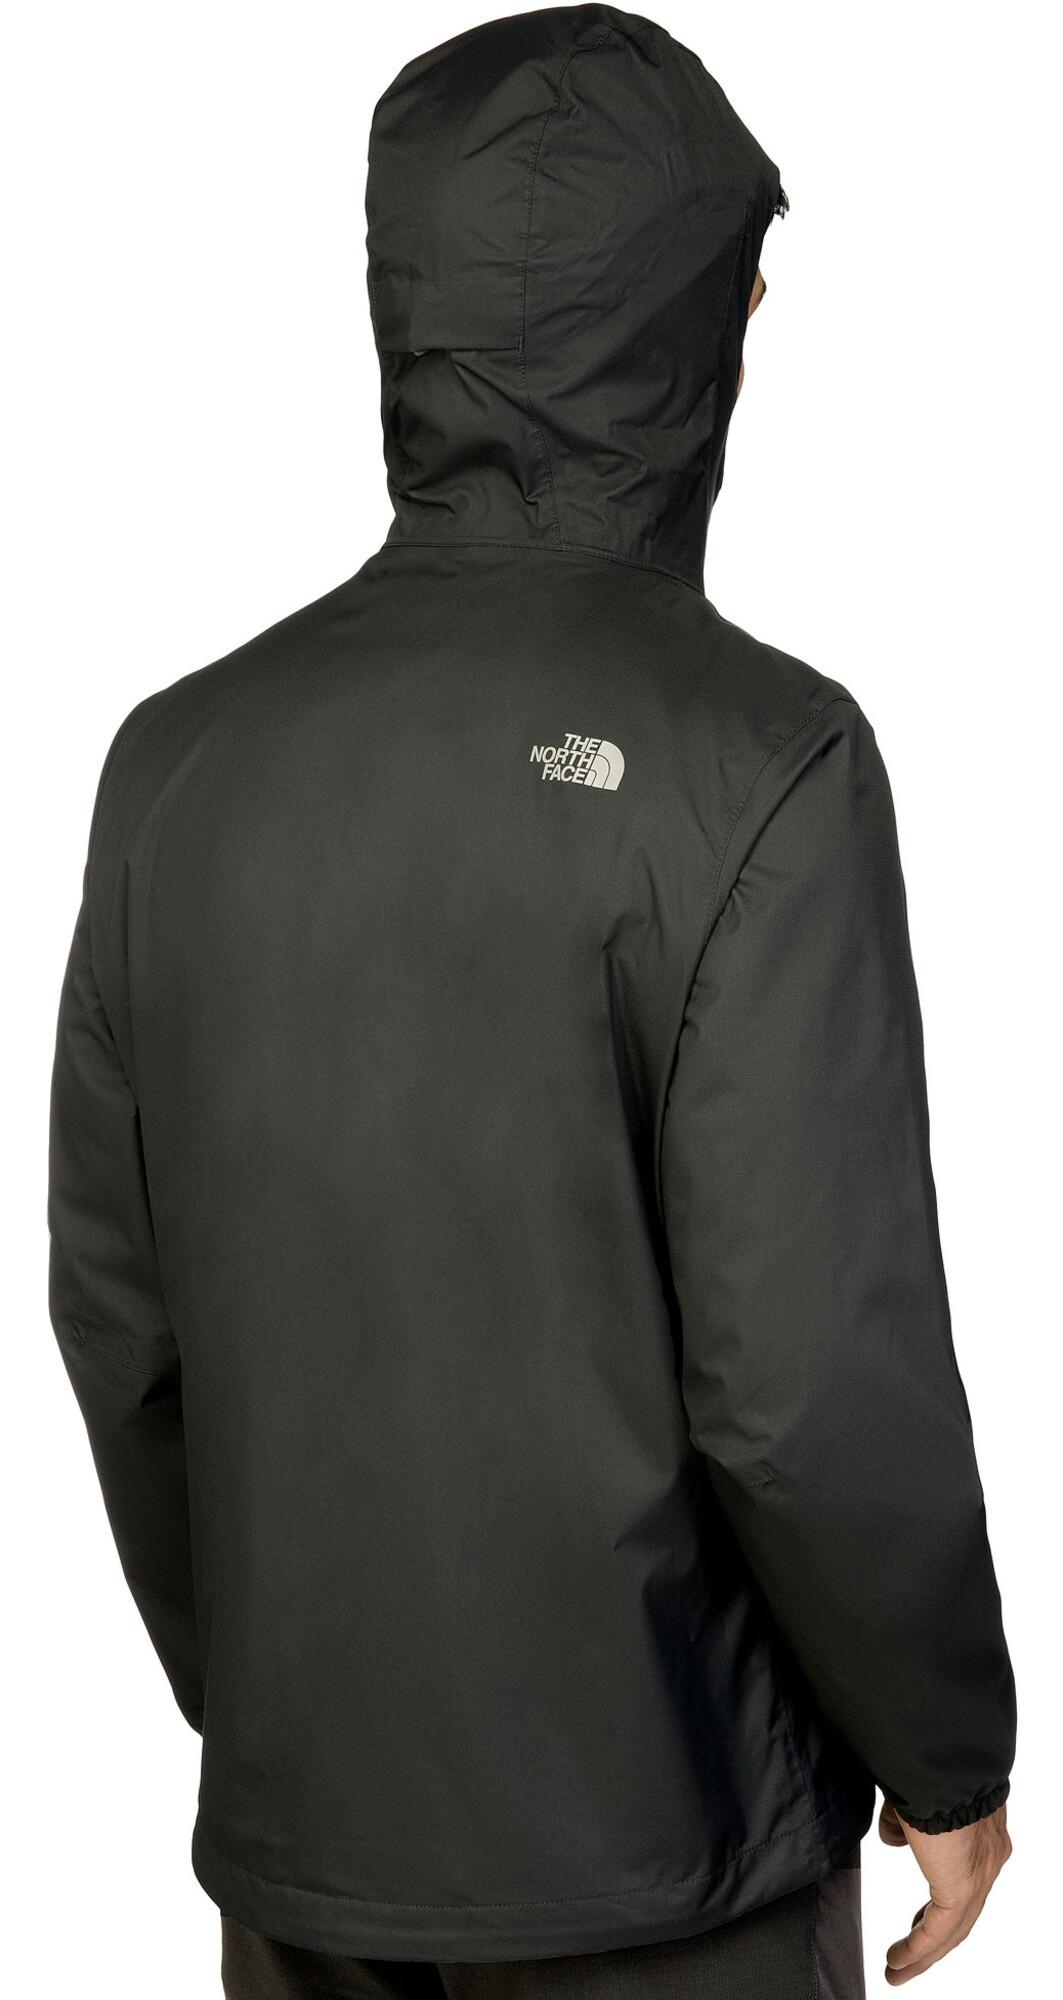 4e2d4aa4d1 The North Face Quest Jacket Men tnf black at Addnature.co.uk